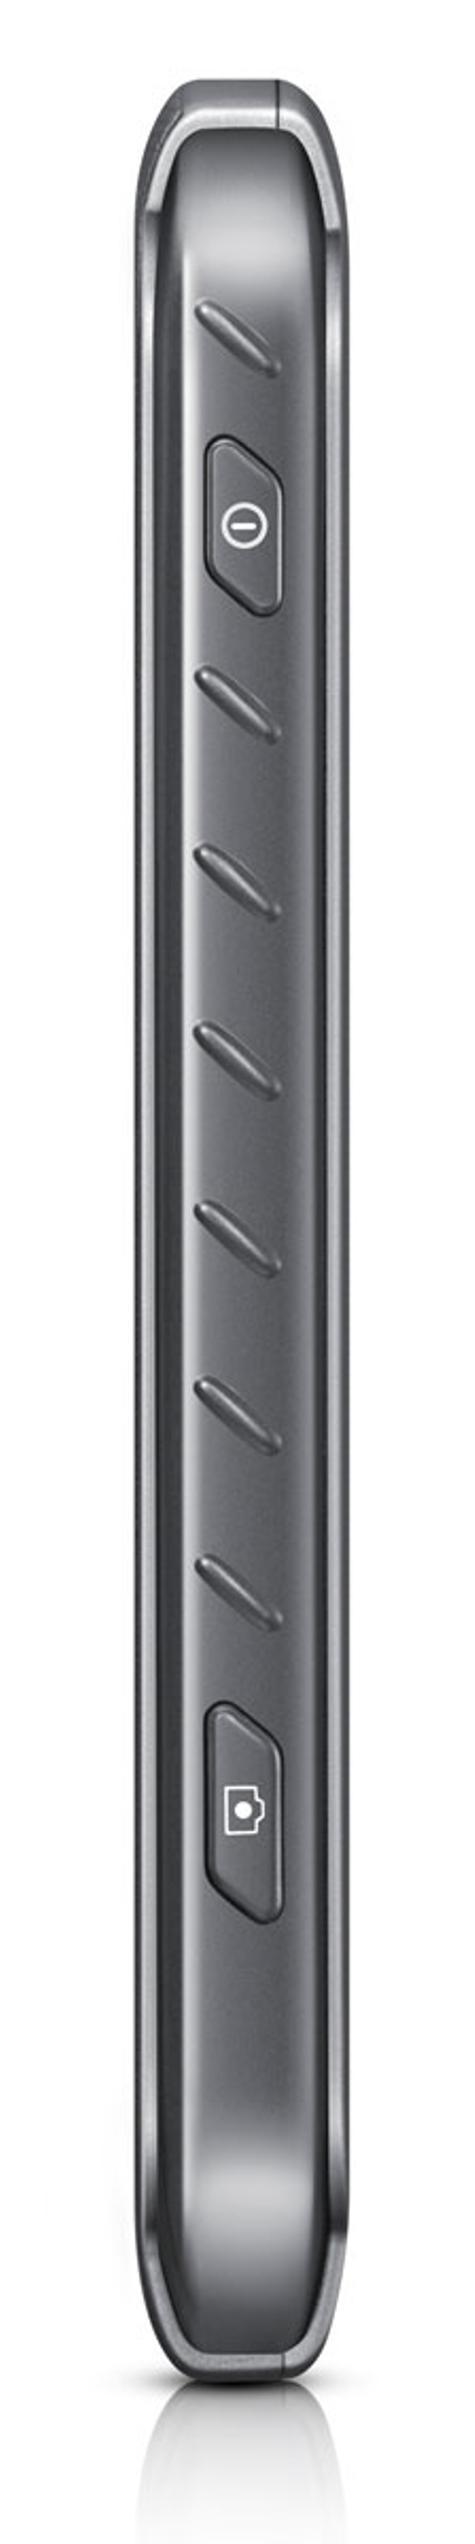 Samsung Galaxy Xcover 2 vista lateral